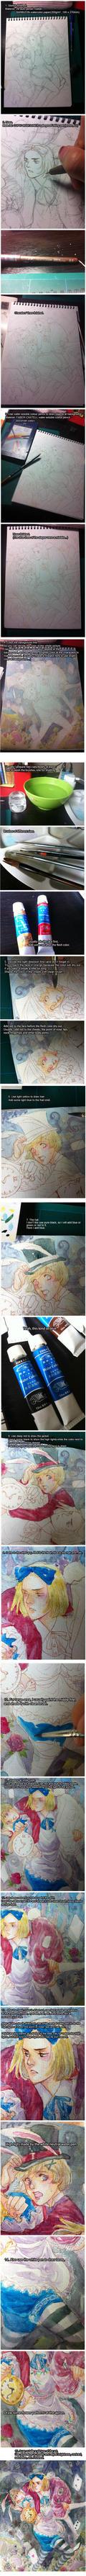 Hand drawn Manga-style watercolor Tutorial by alexzoe